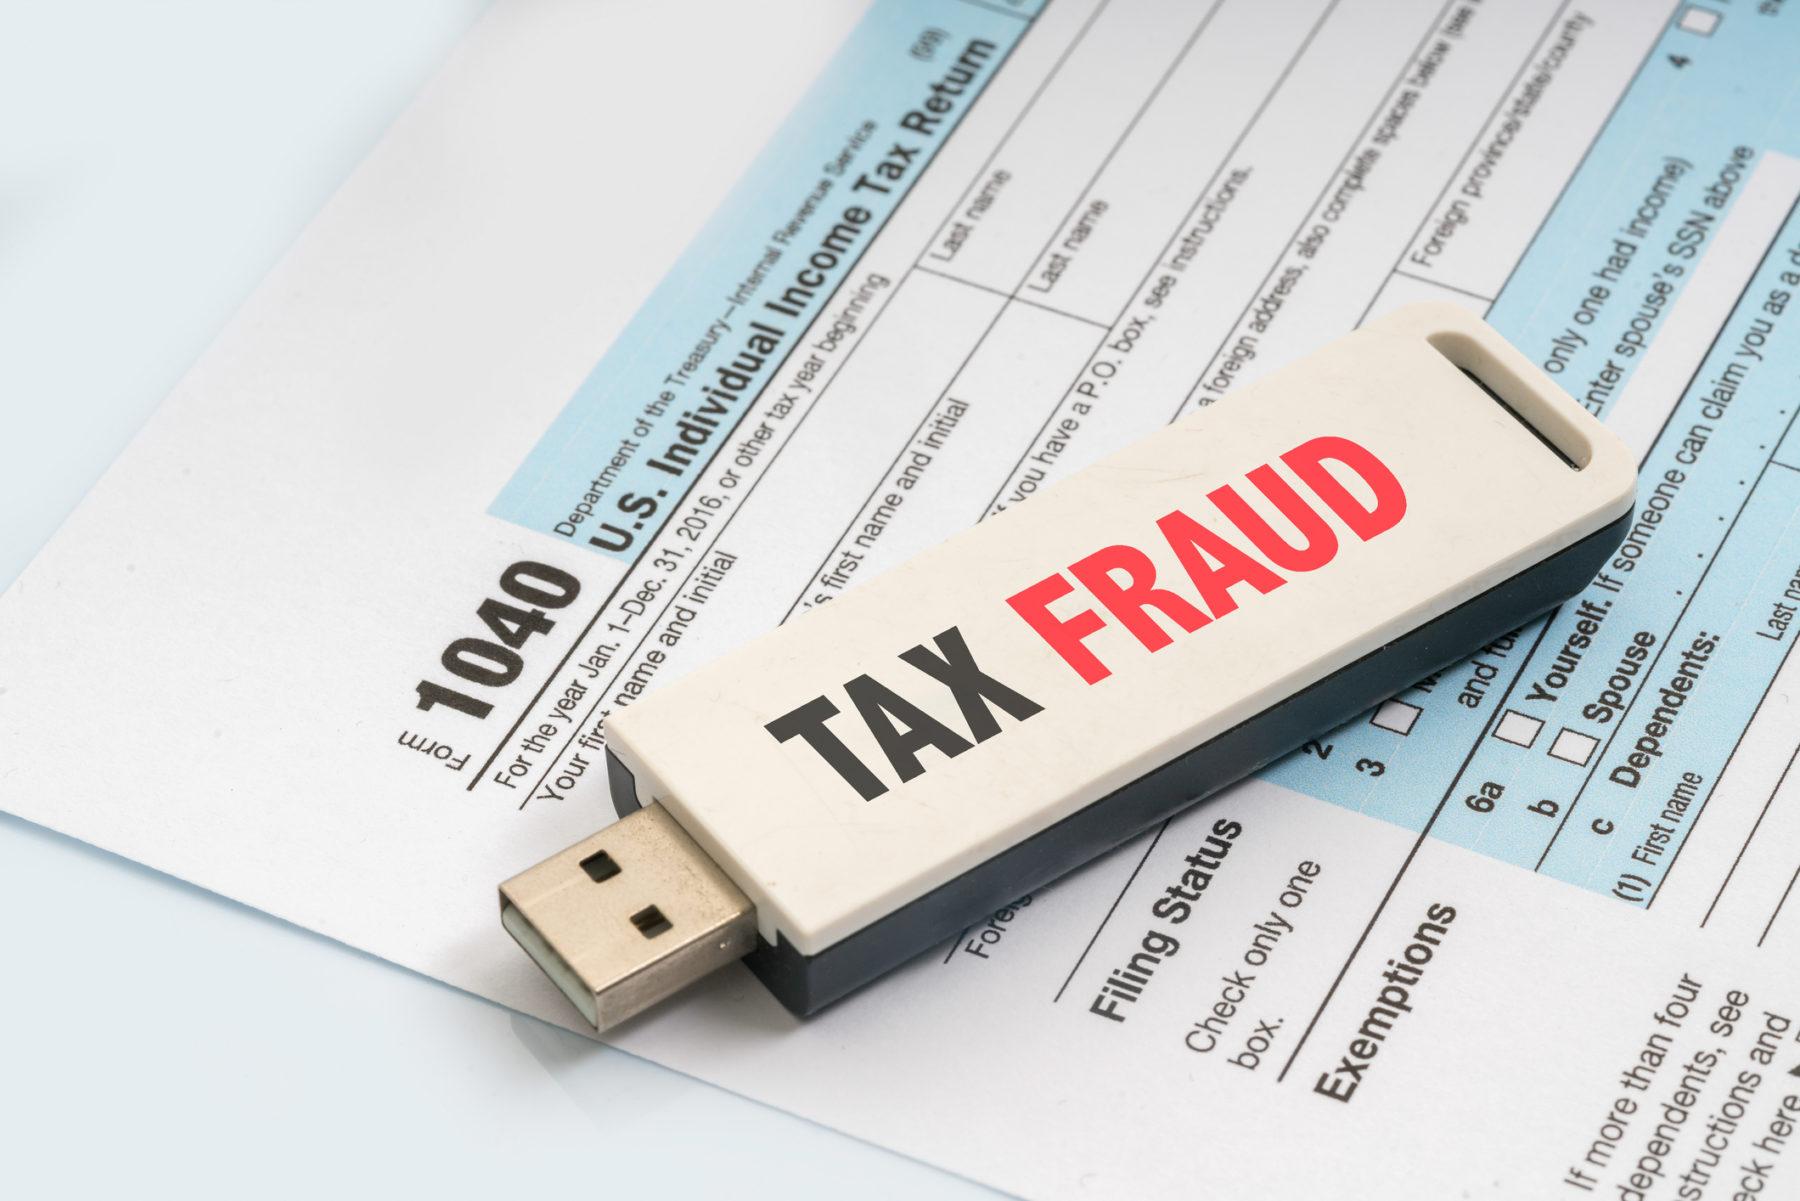 FITSNews – Defendant Sentenced In Florence, South Carolina Tax Fraud Case